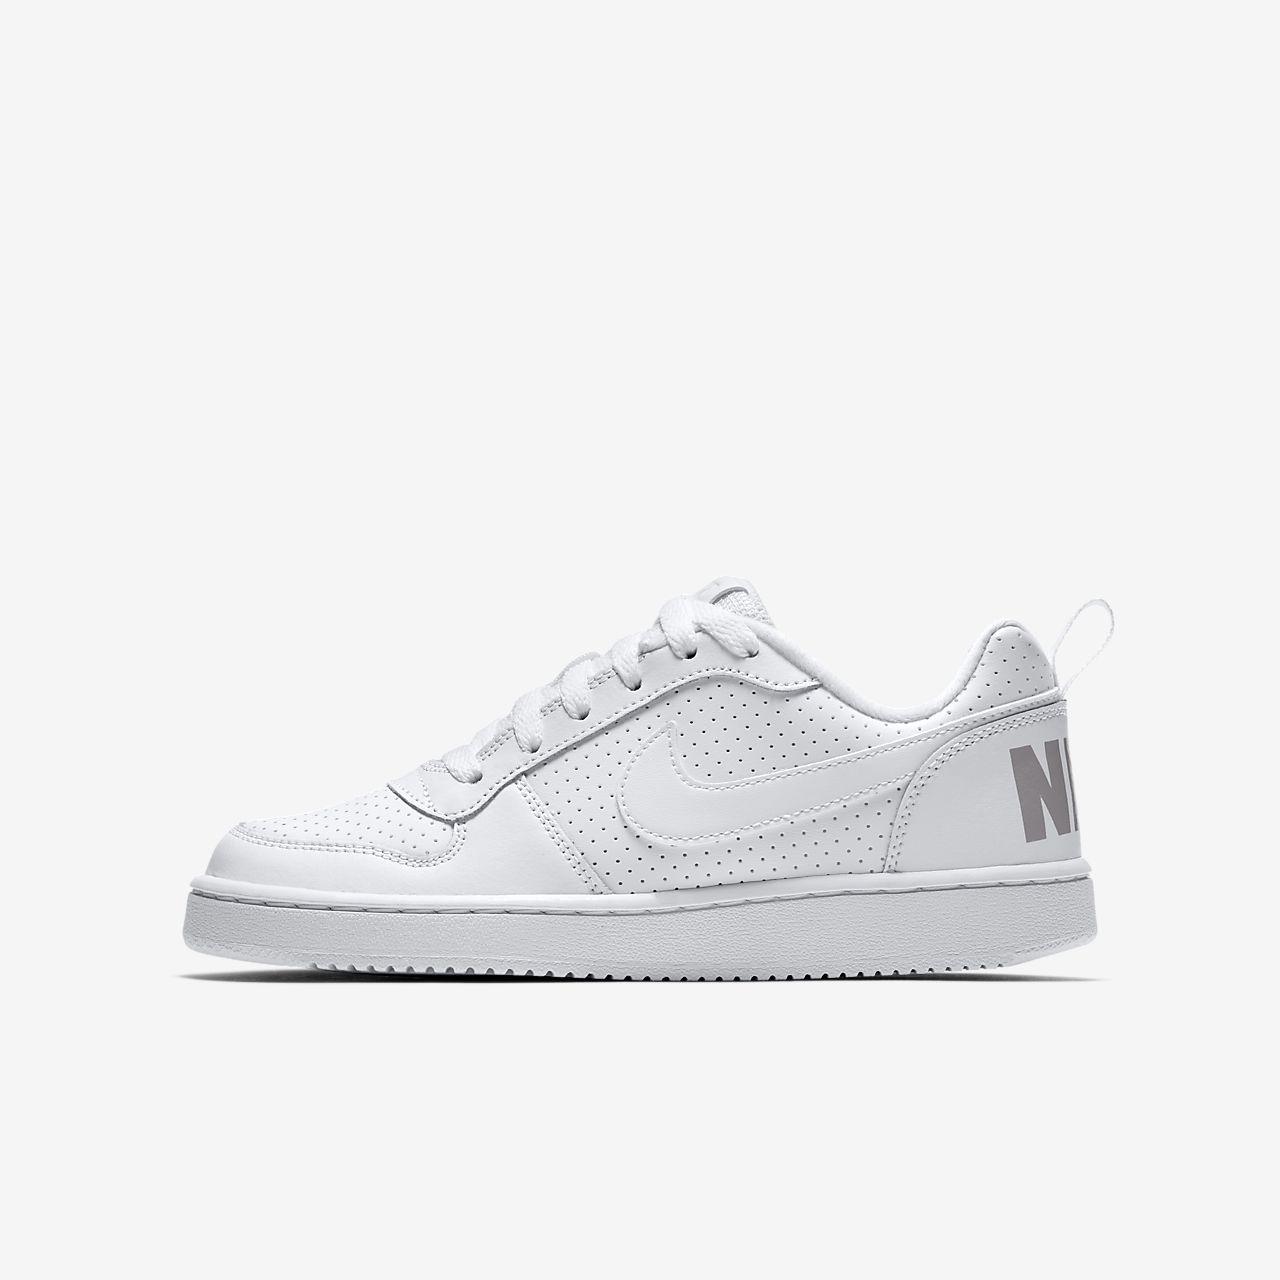 0f73508e925 ... best price nikecourt borough low sko til store børn fdbb7 08d9e